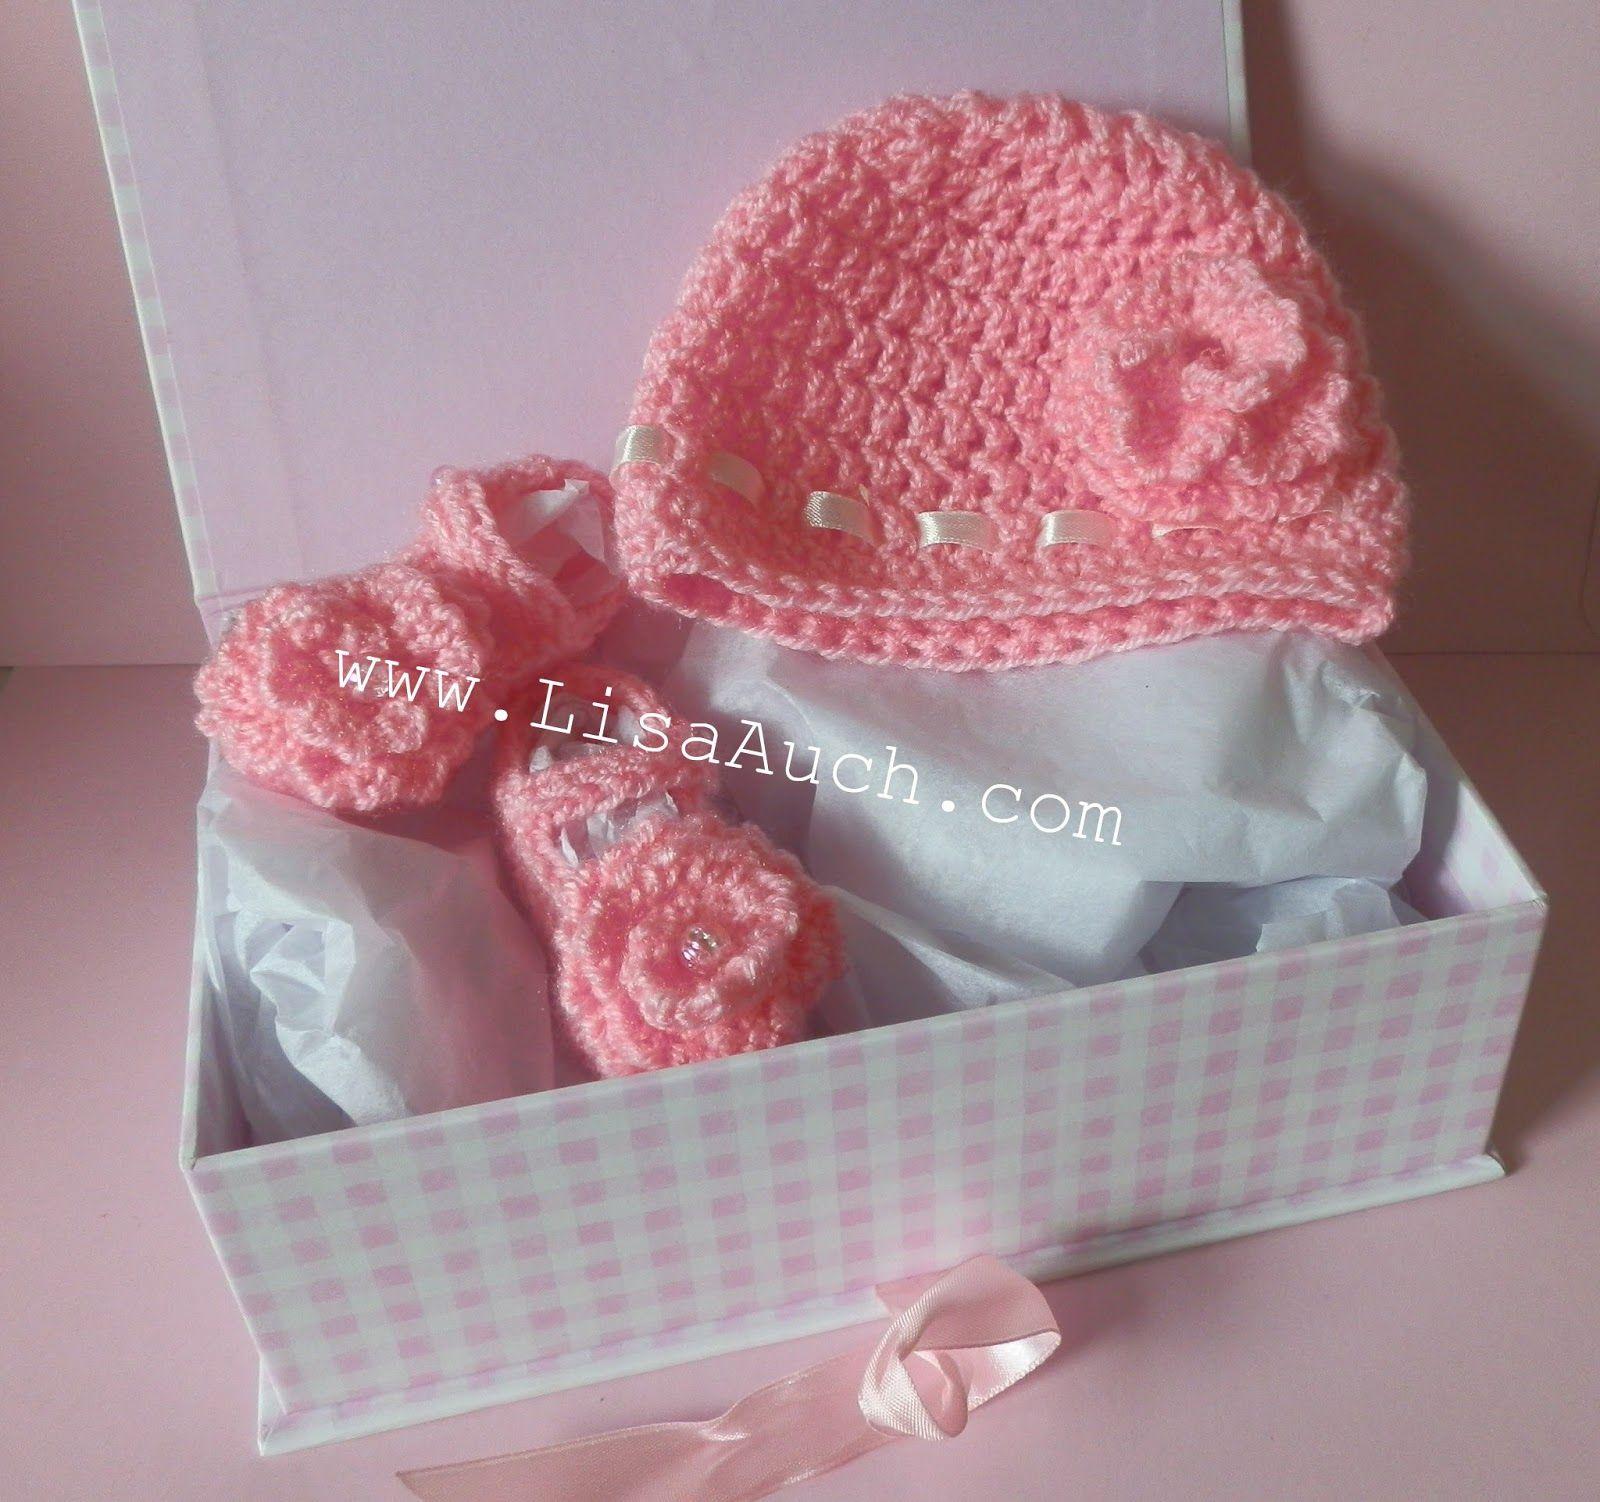 Free+Crochet+Pattern | free+crochet+patterns-crochet+hat+pattern ...